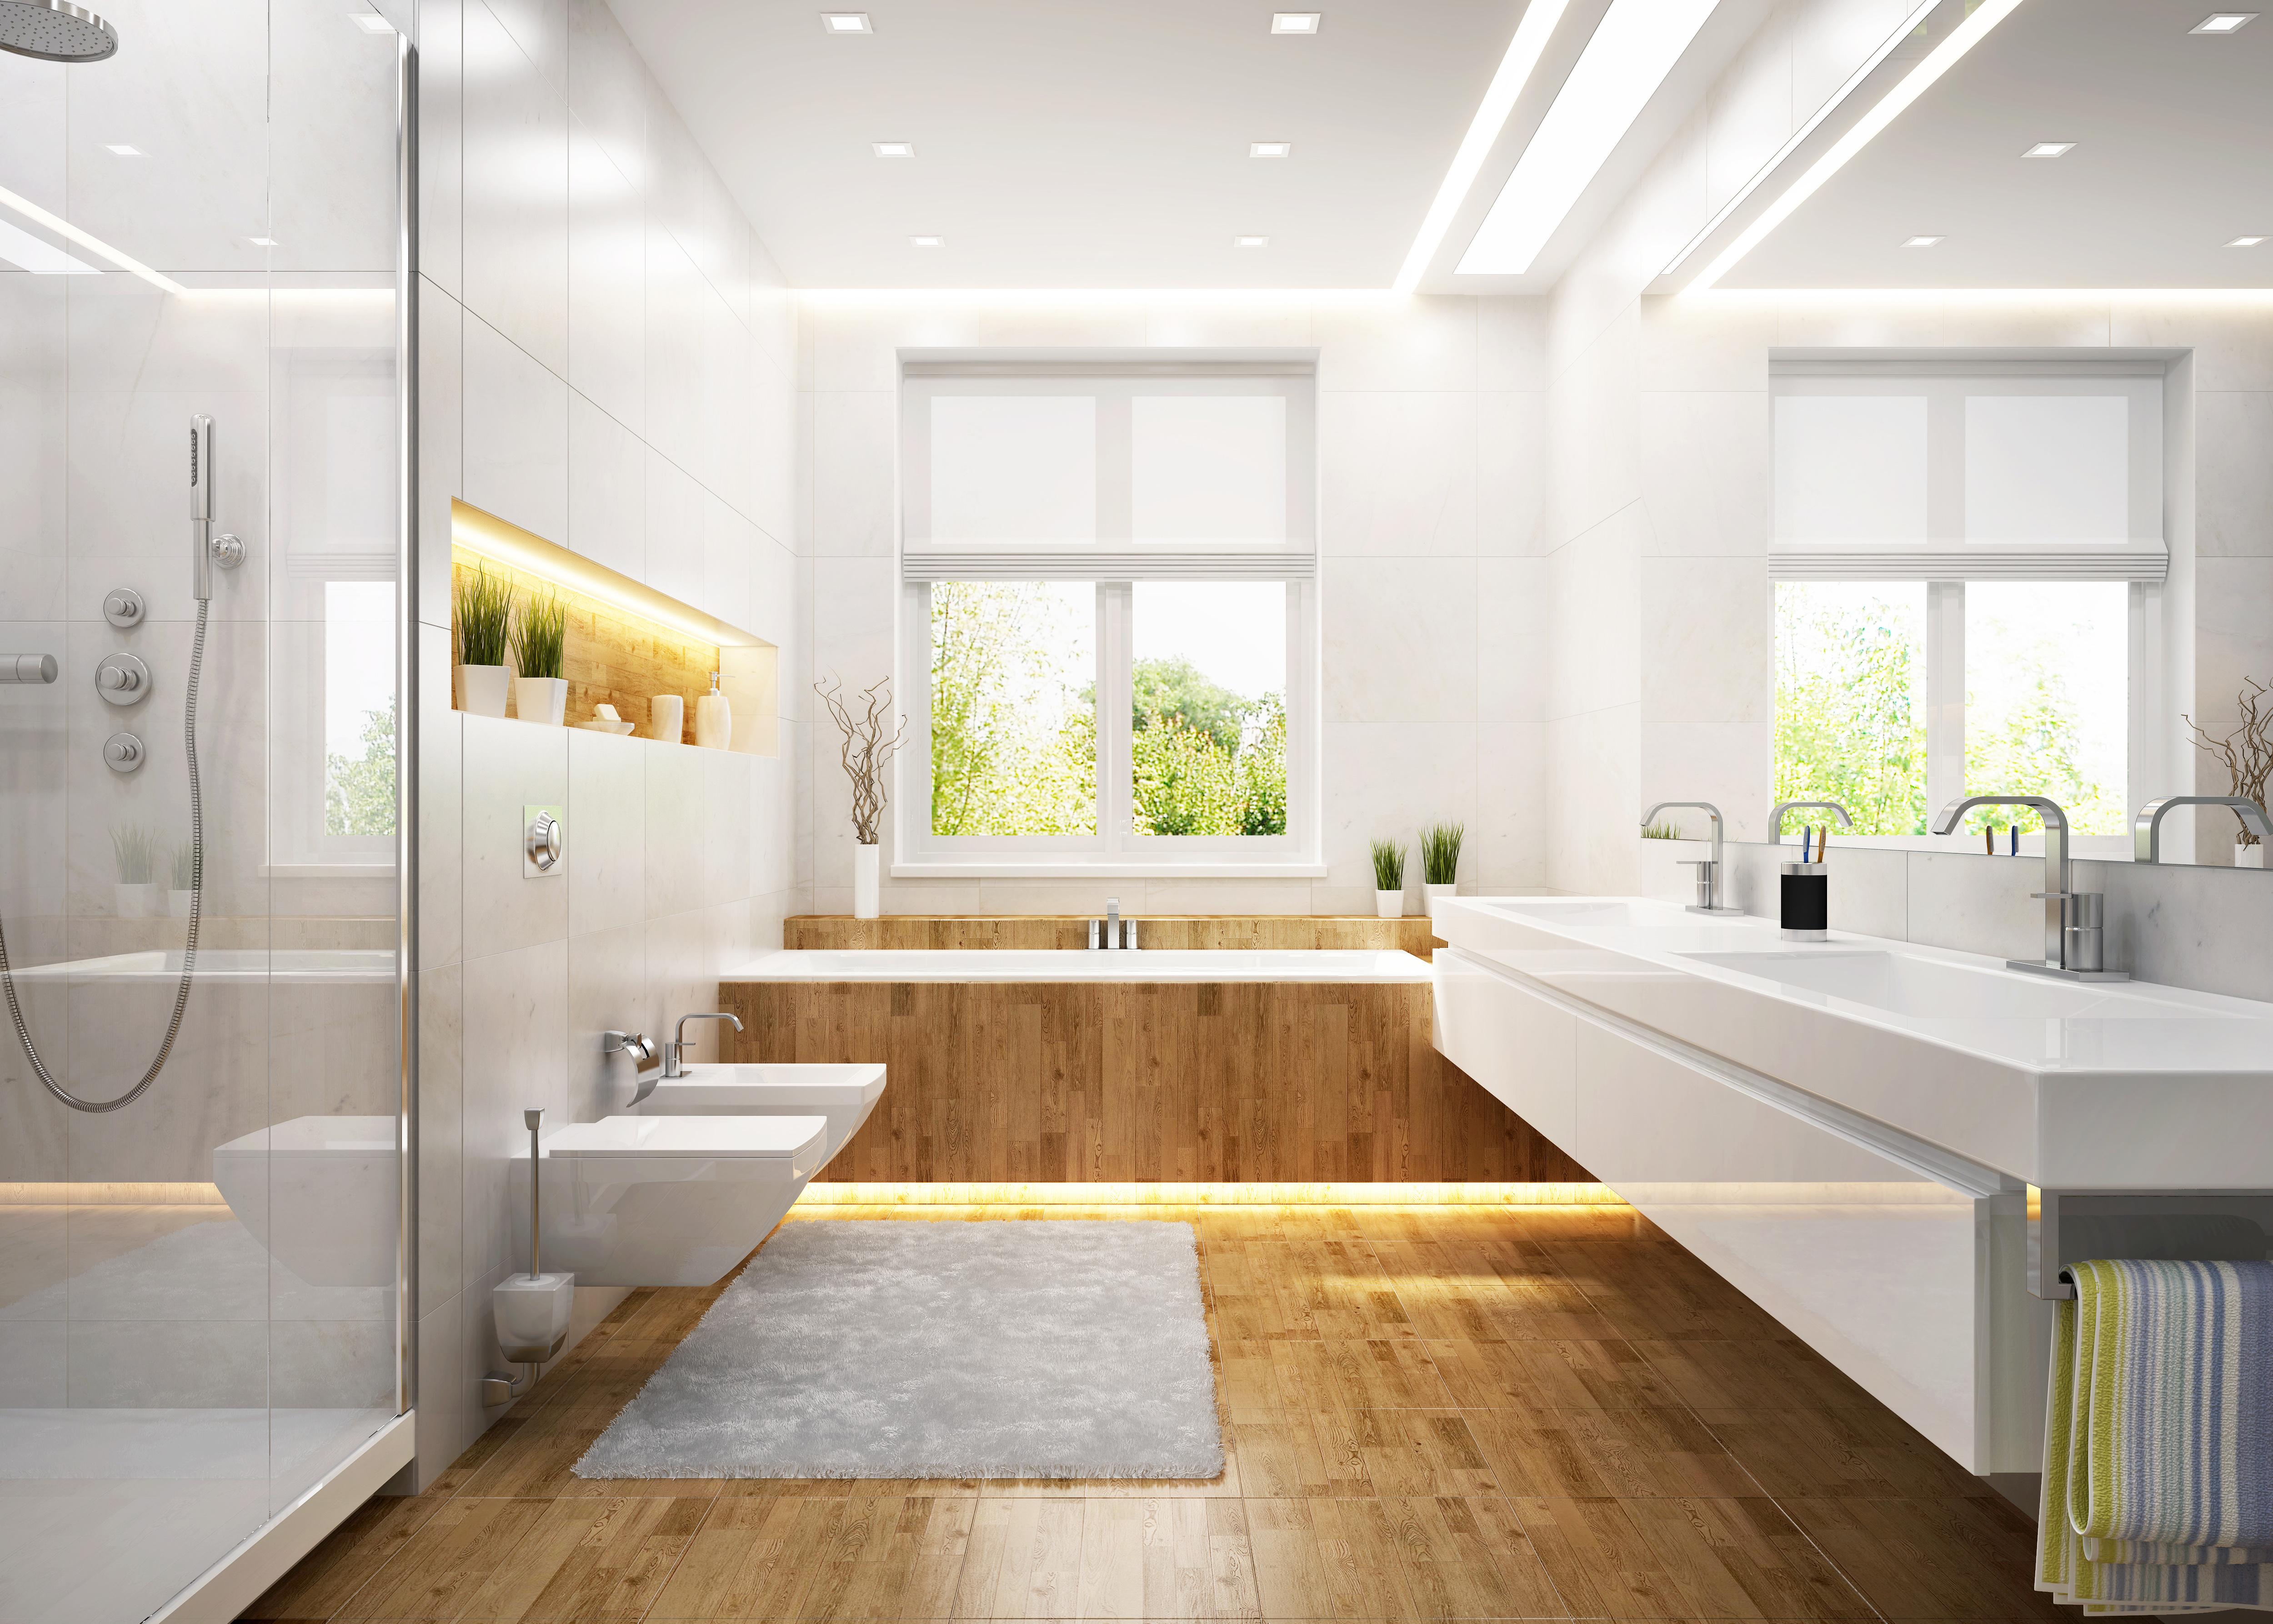 Selecting Bespoke Bathroom Cabinets Like Buying a Bespoke Kitchen